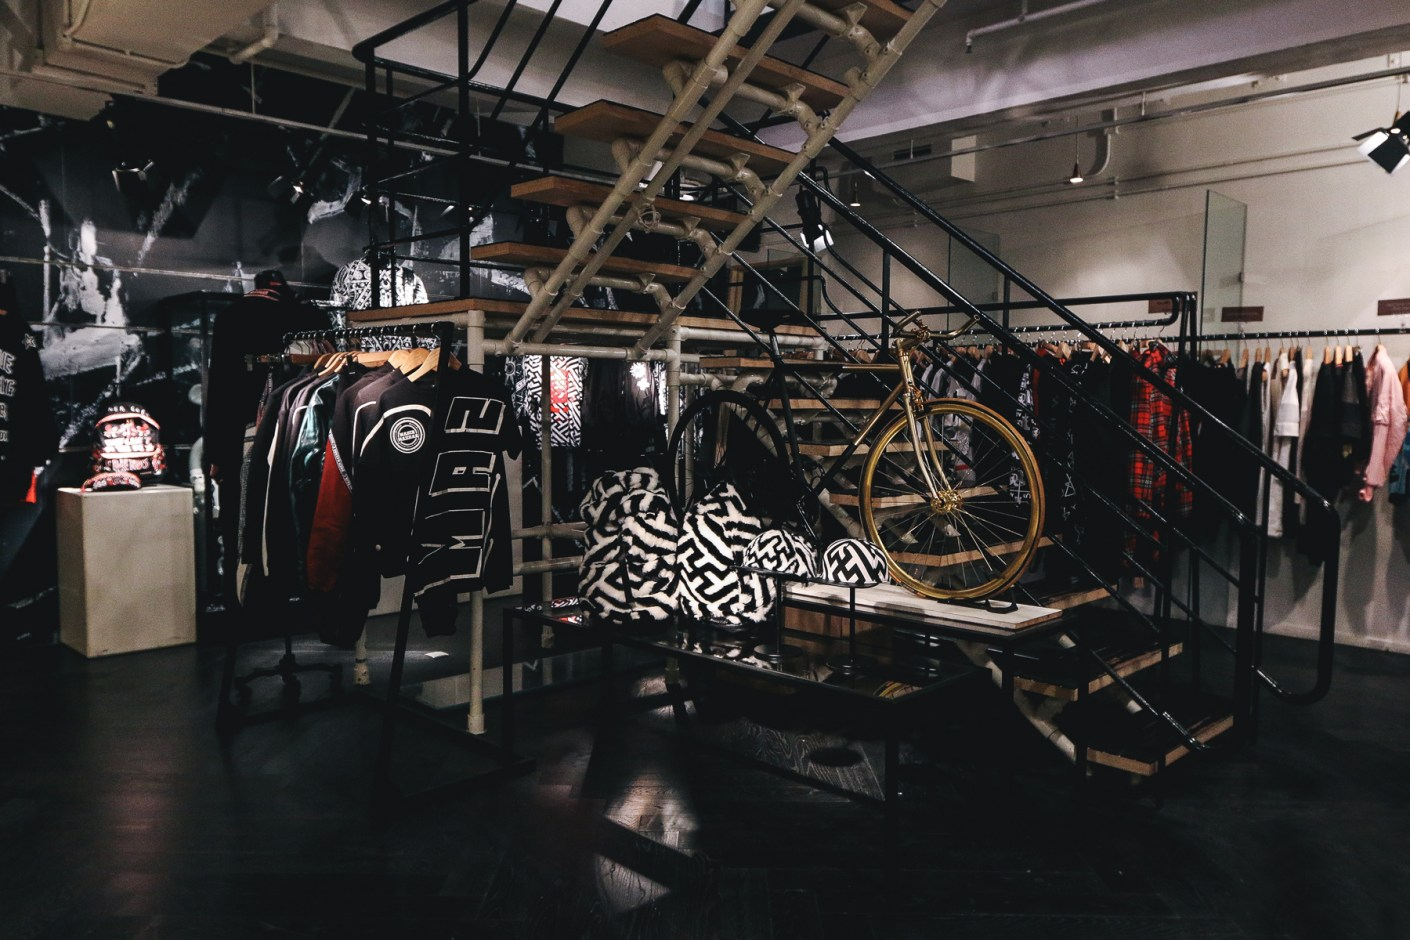 Image of A Closer Look Inside the D-mop Concept Store on On Lan Street Hong Kong